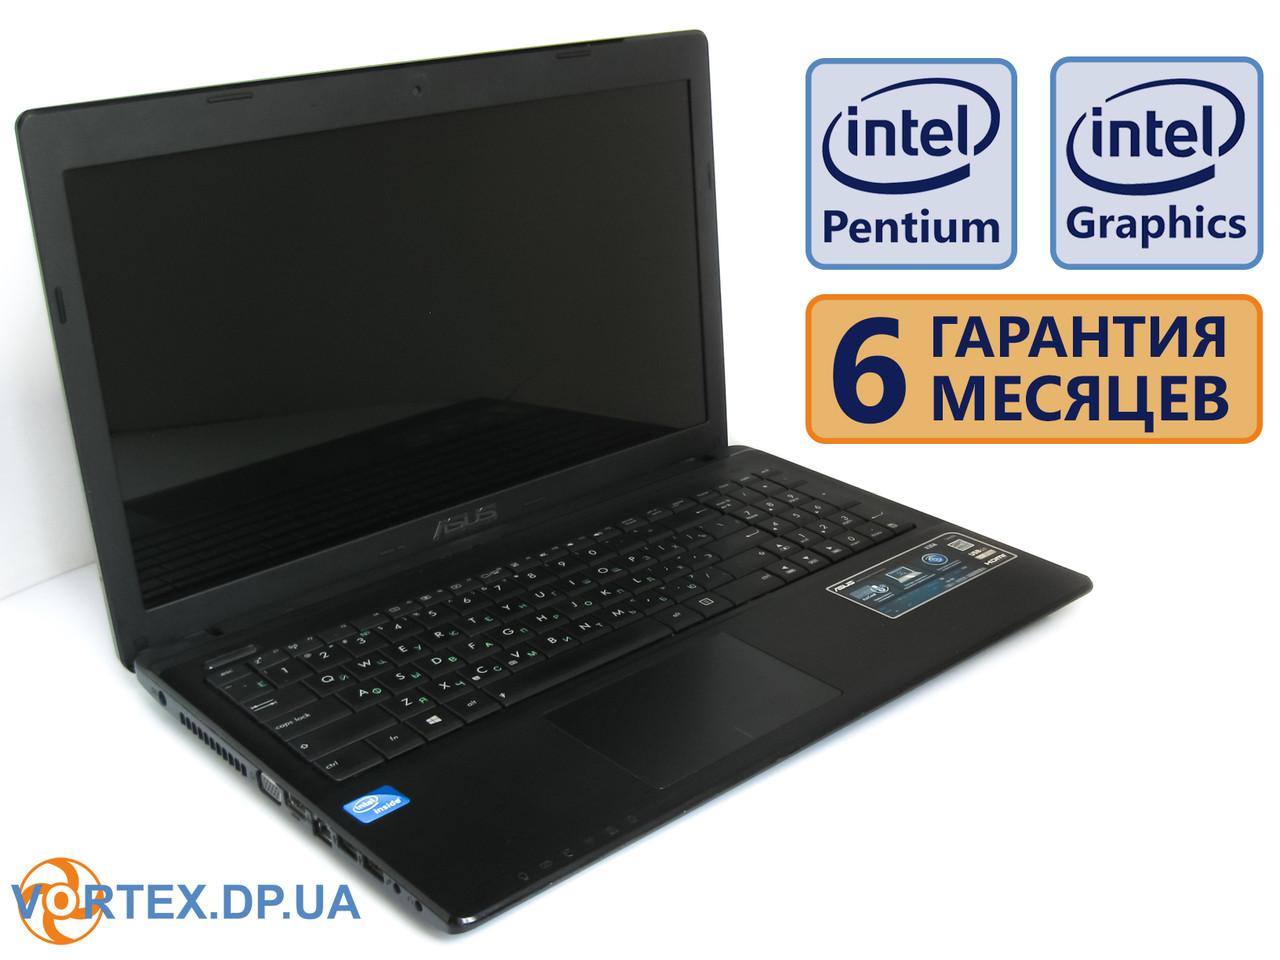 Ноутбук Asus X55 15.6 (1366x768) / Intel Pentium 2020M (2x2.4GHz) / RA